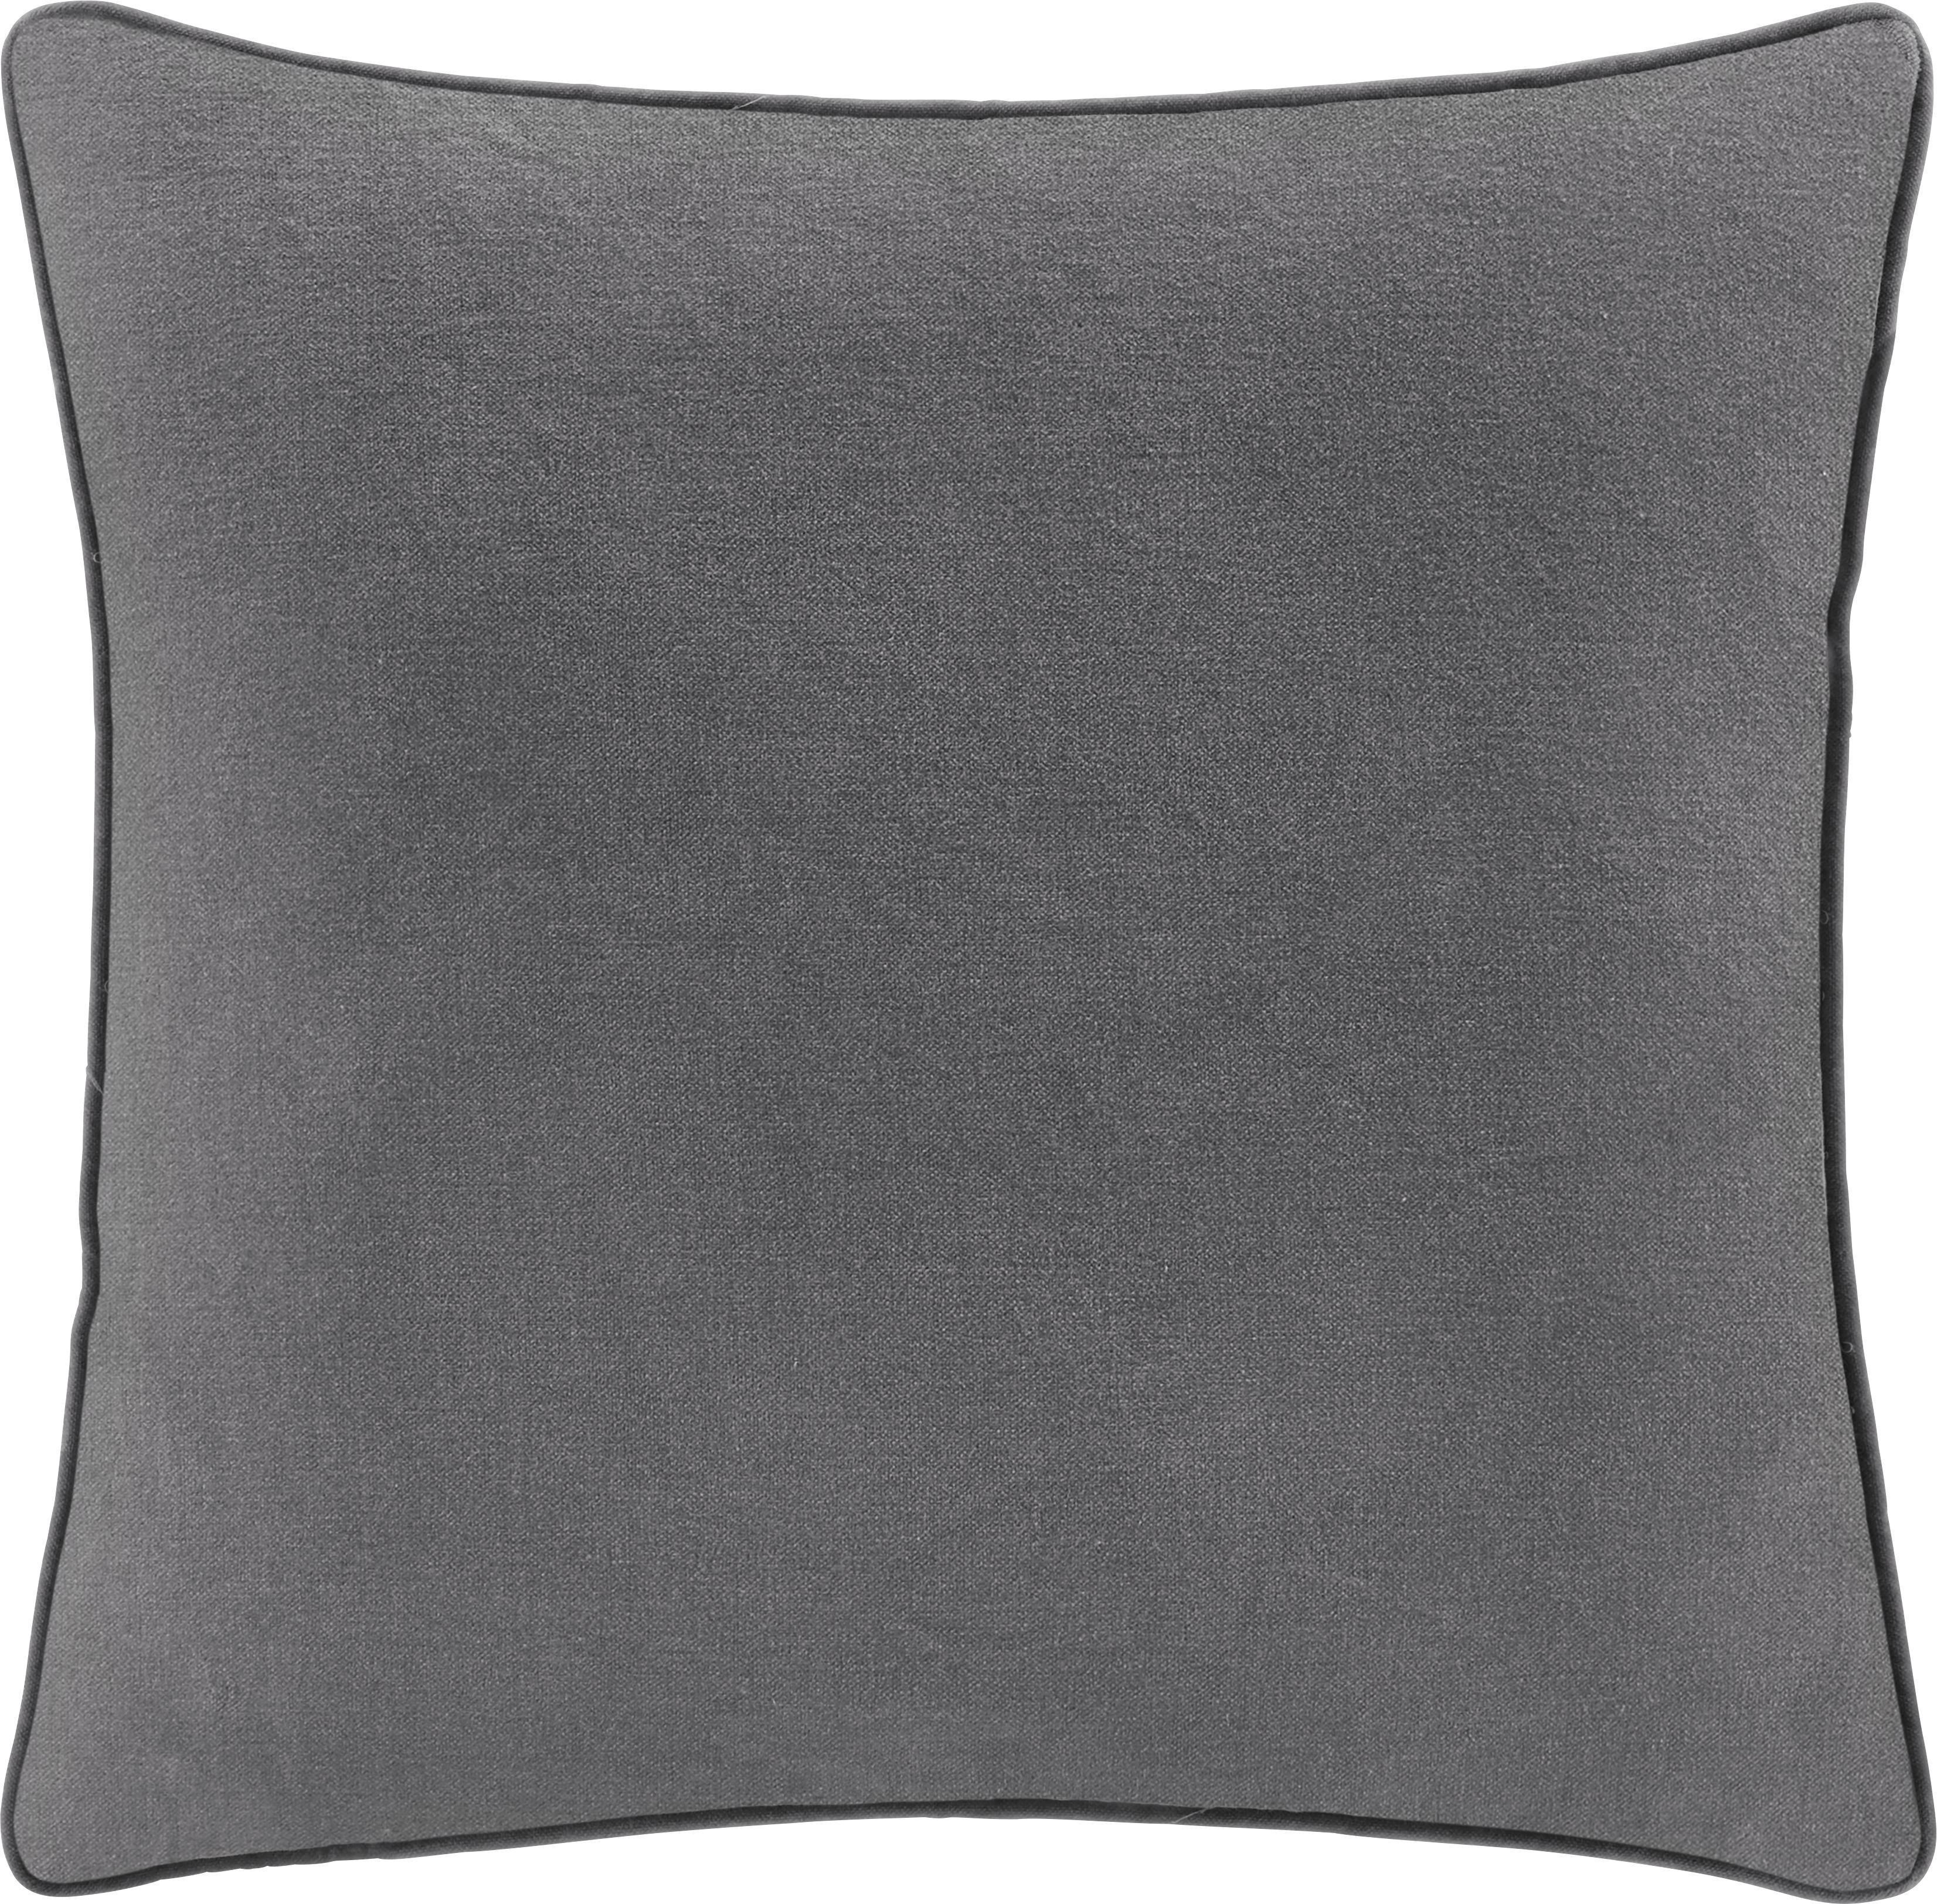 Zierkissen Carolyn 45x45cm - Hellgrau, MODERN, Textil (45/45cm) - MÖMAX modern living